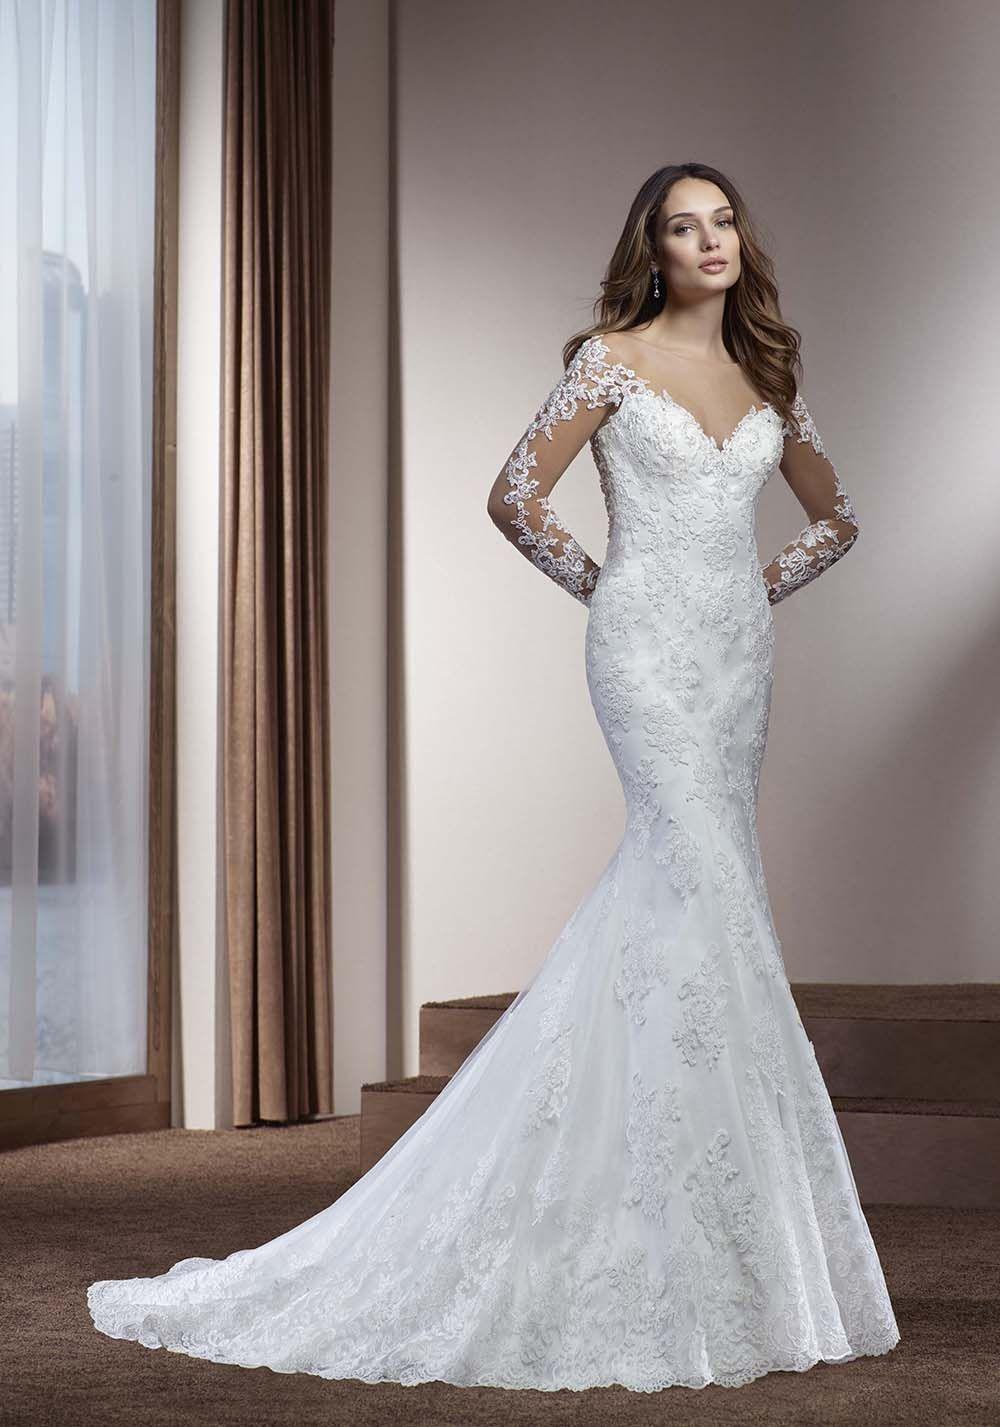 Robe 182 04 Robe De Mariee Divina Sposa 2018 Wedding Dresses